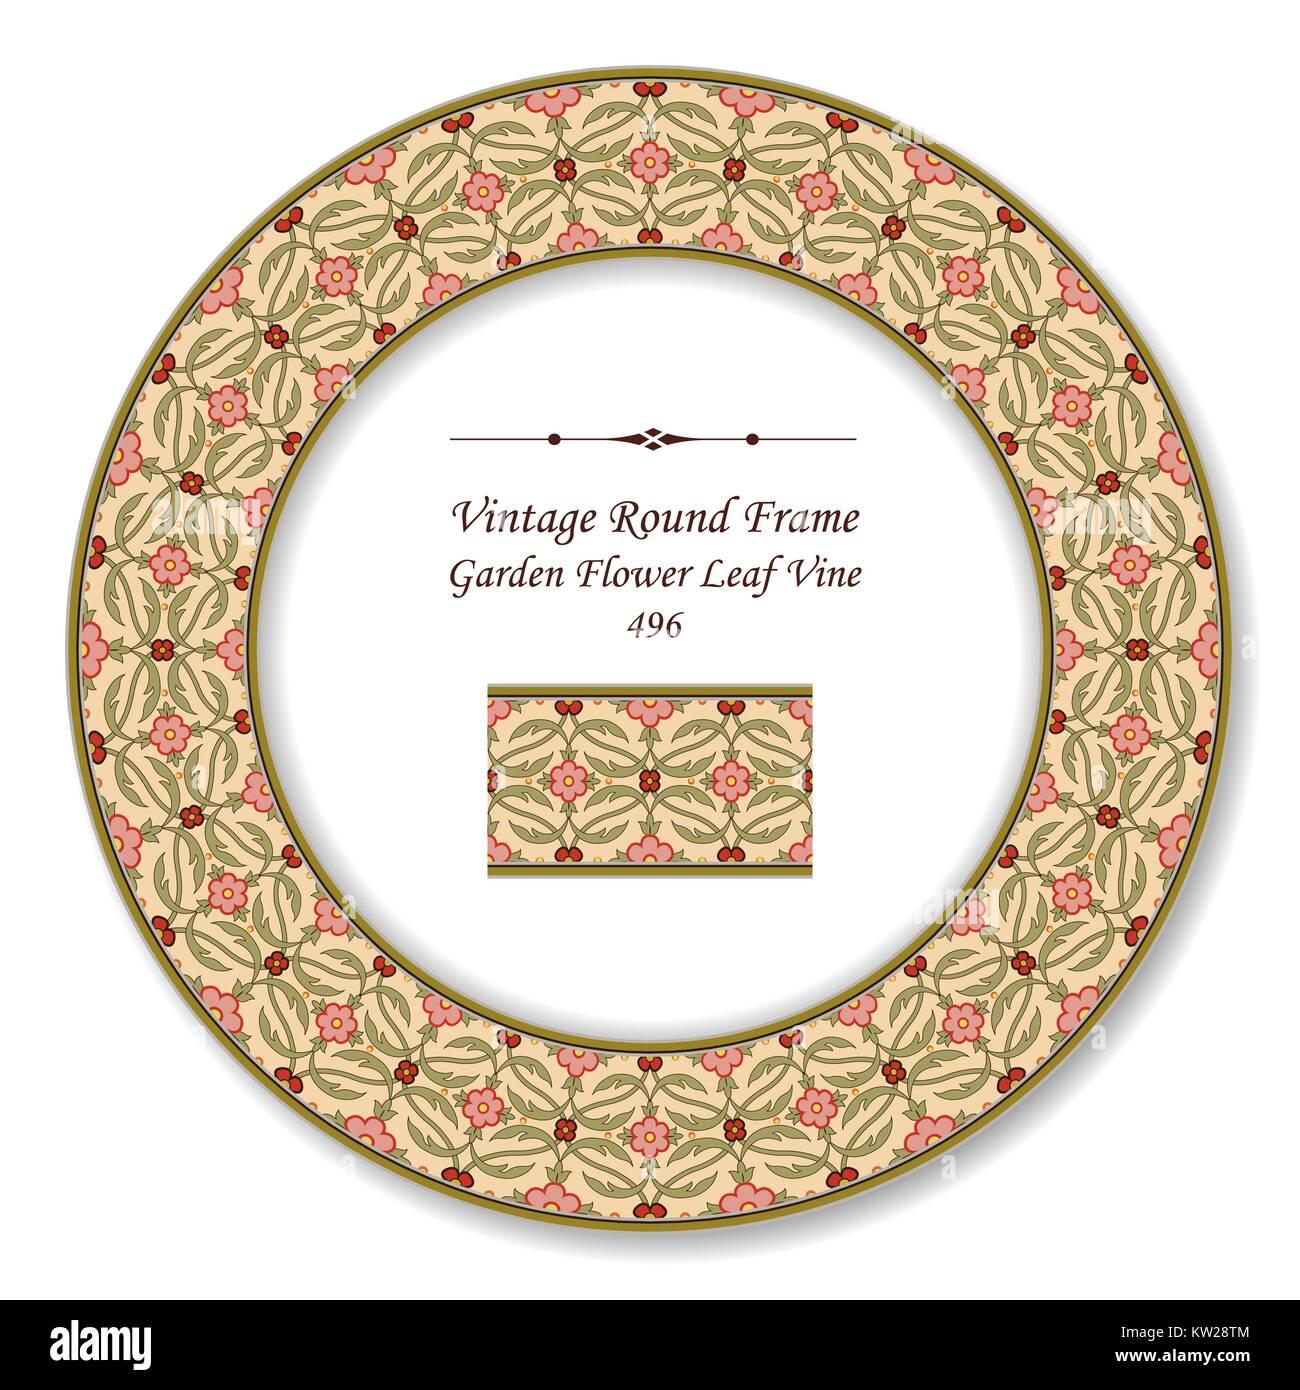 Vintage Round Retro Frame of Botanic Garden Flower Leaf Vine Stock Vector